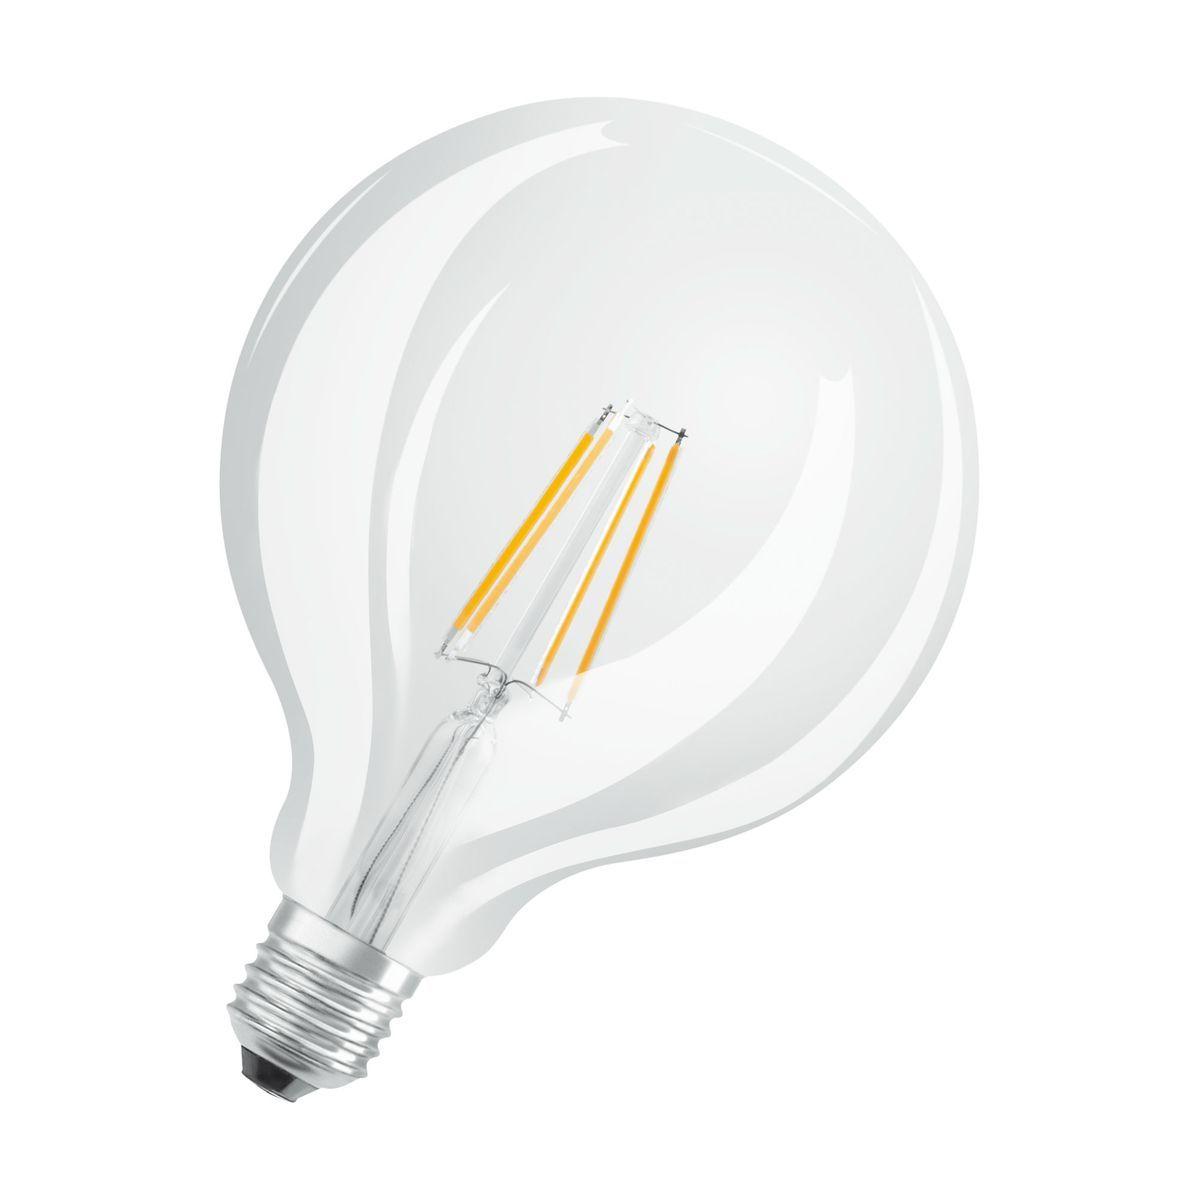 Ampoule Led Filament Globe E27 2700k 7w 60w 806 Lumens O12 5cm Dimmable Taille Taille Unique Led Filament Ampoule Et Led